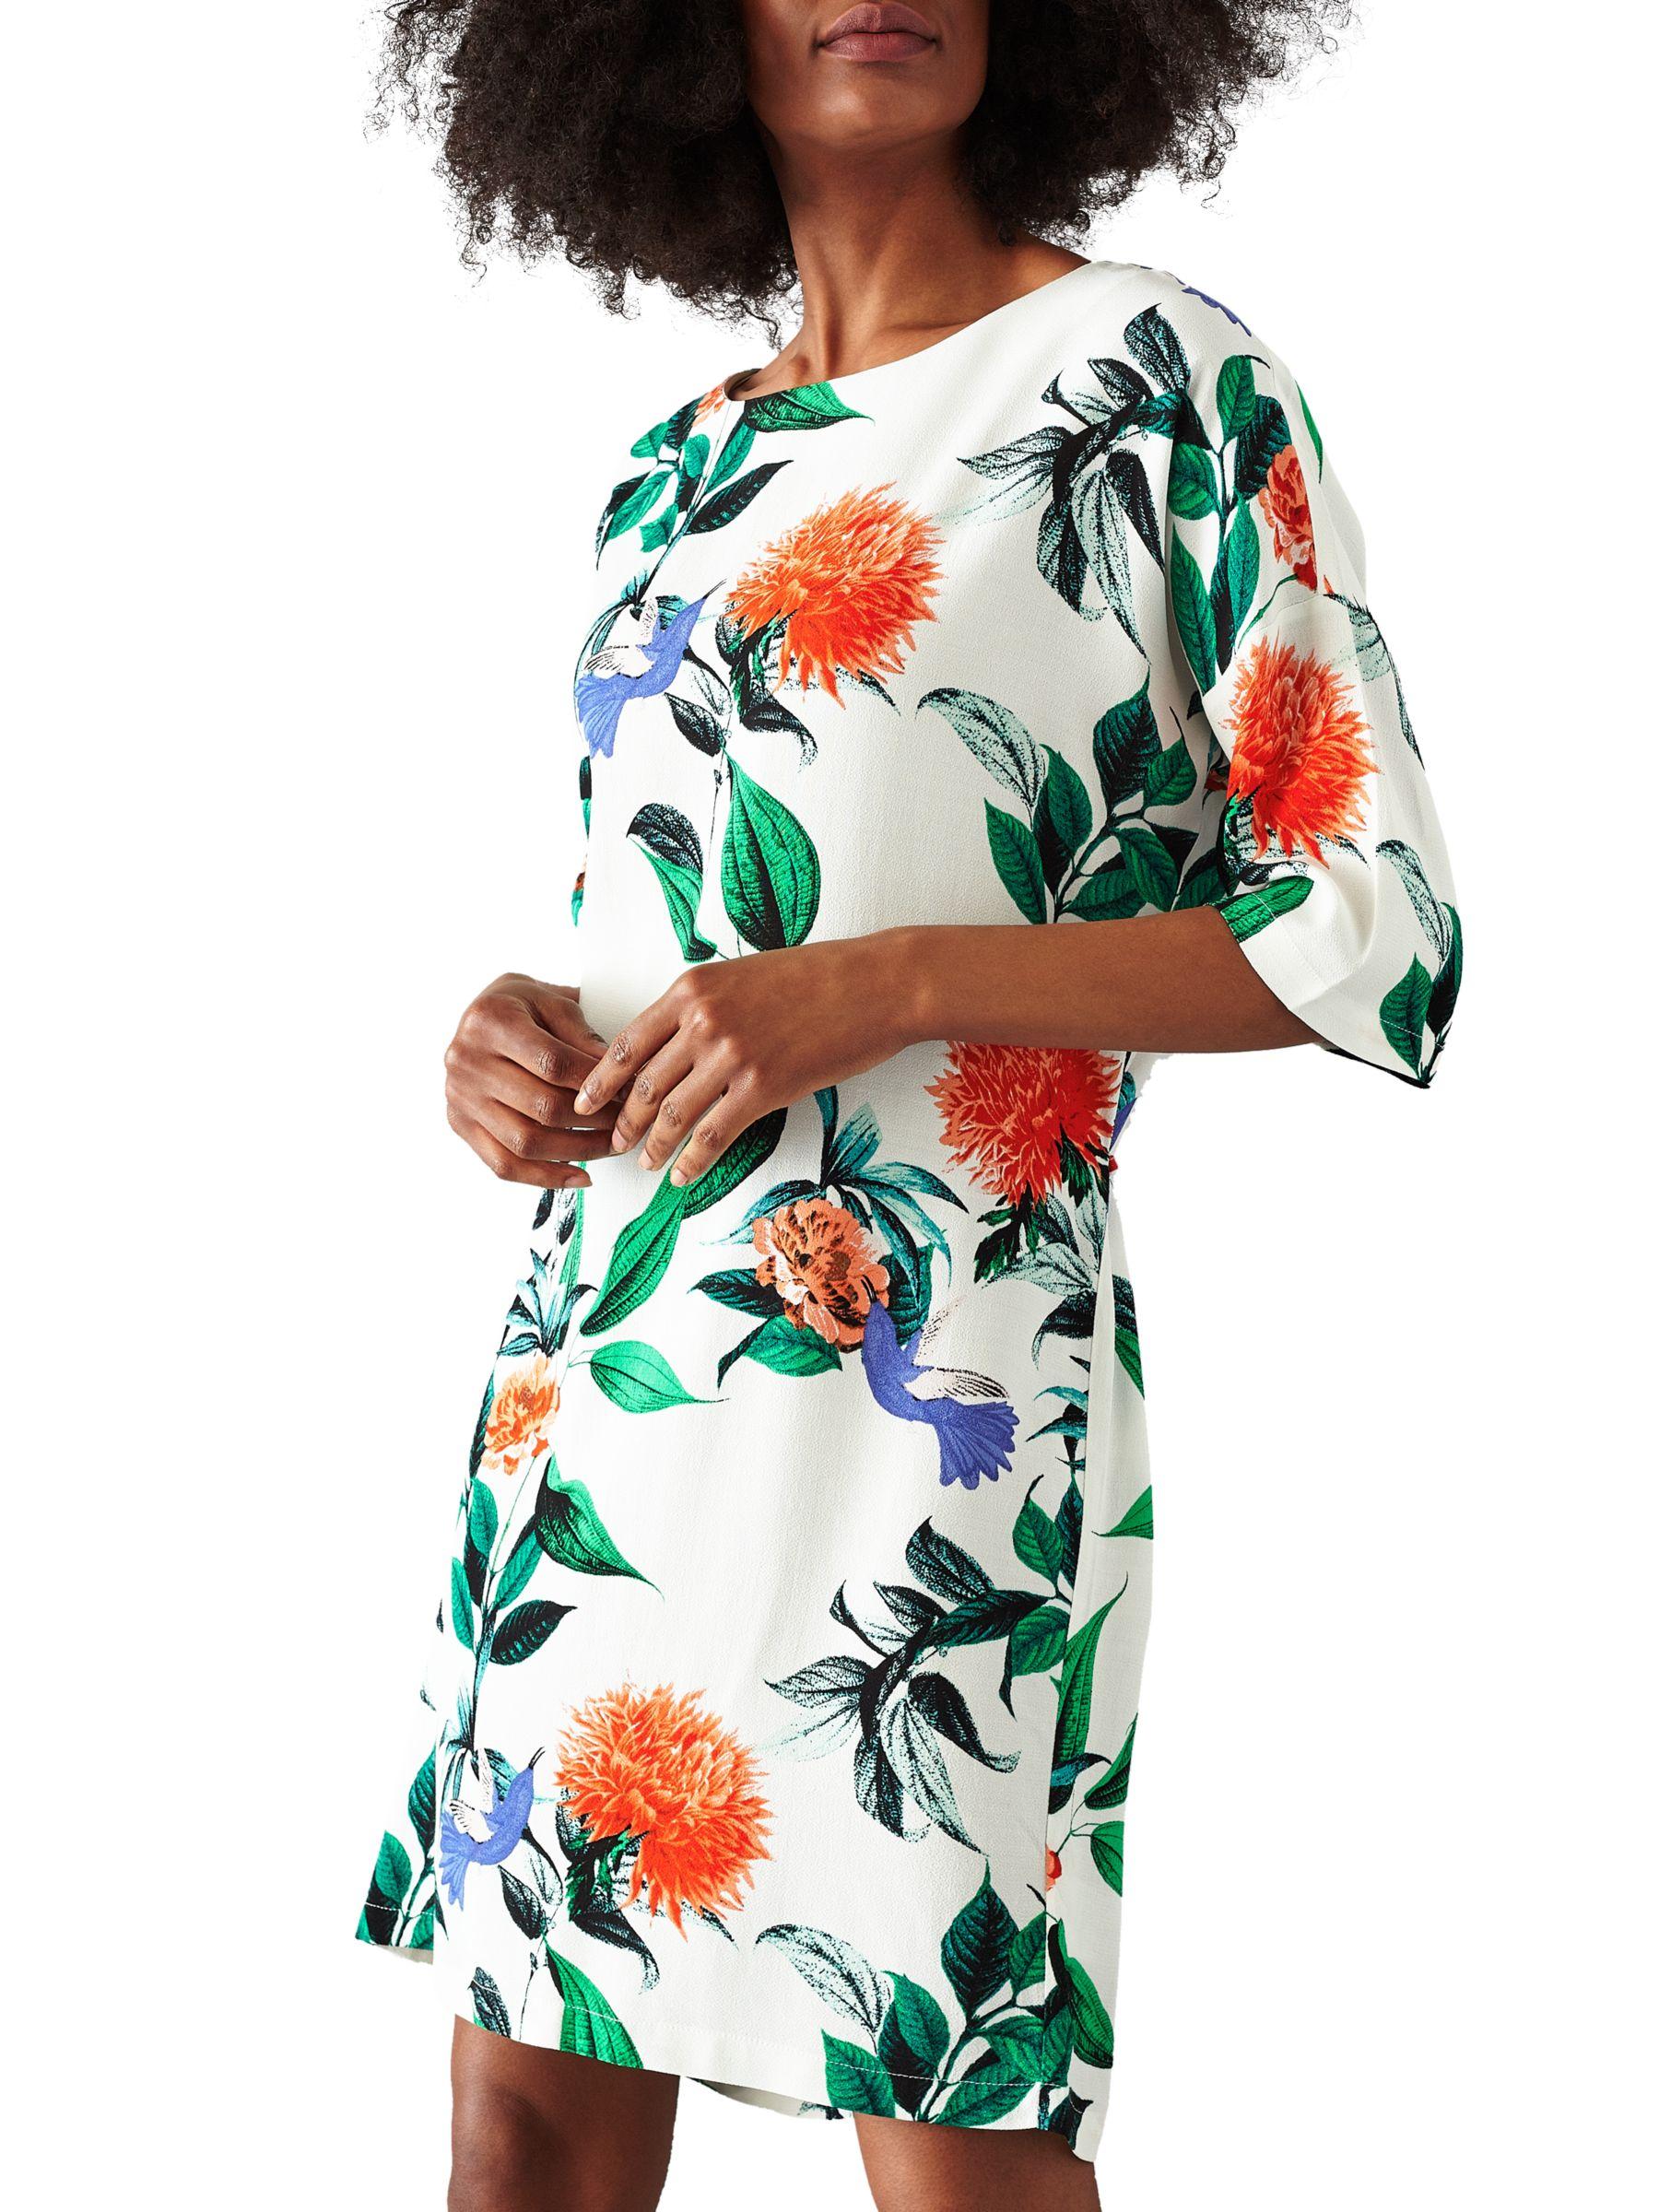 Minimum Minimum Josefine Dress, White Floral